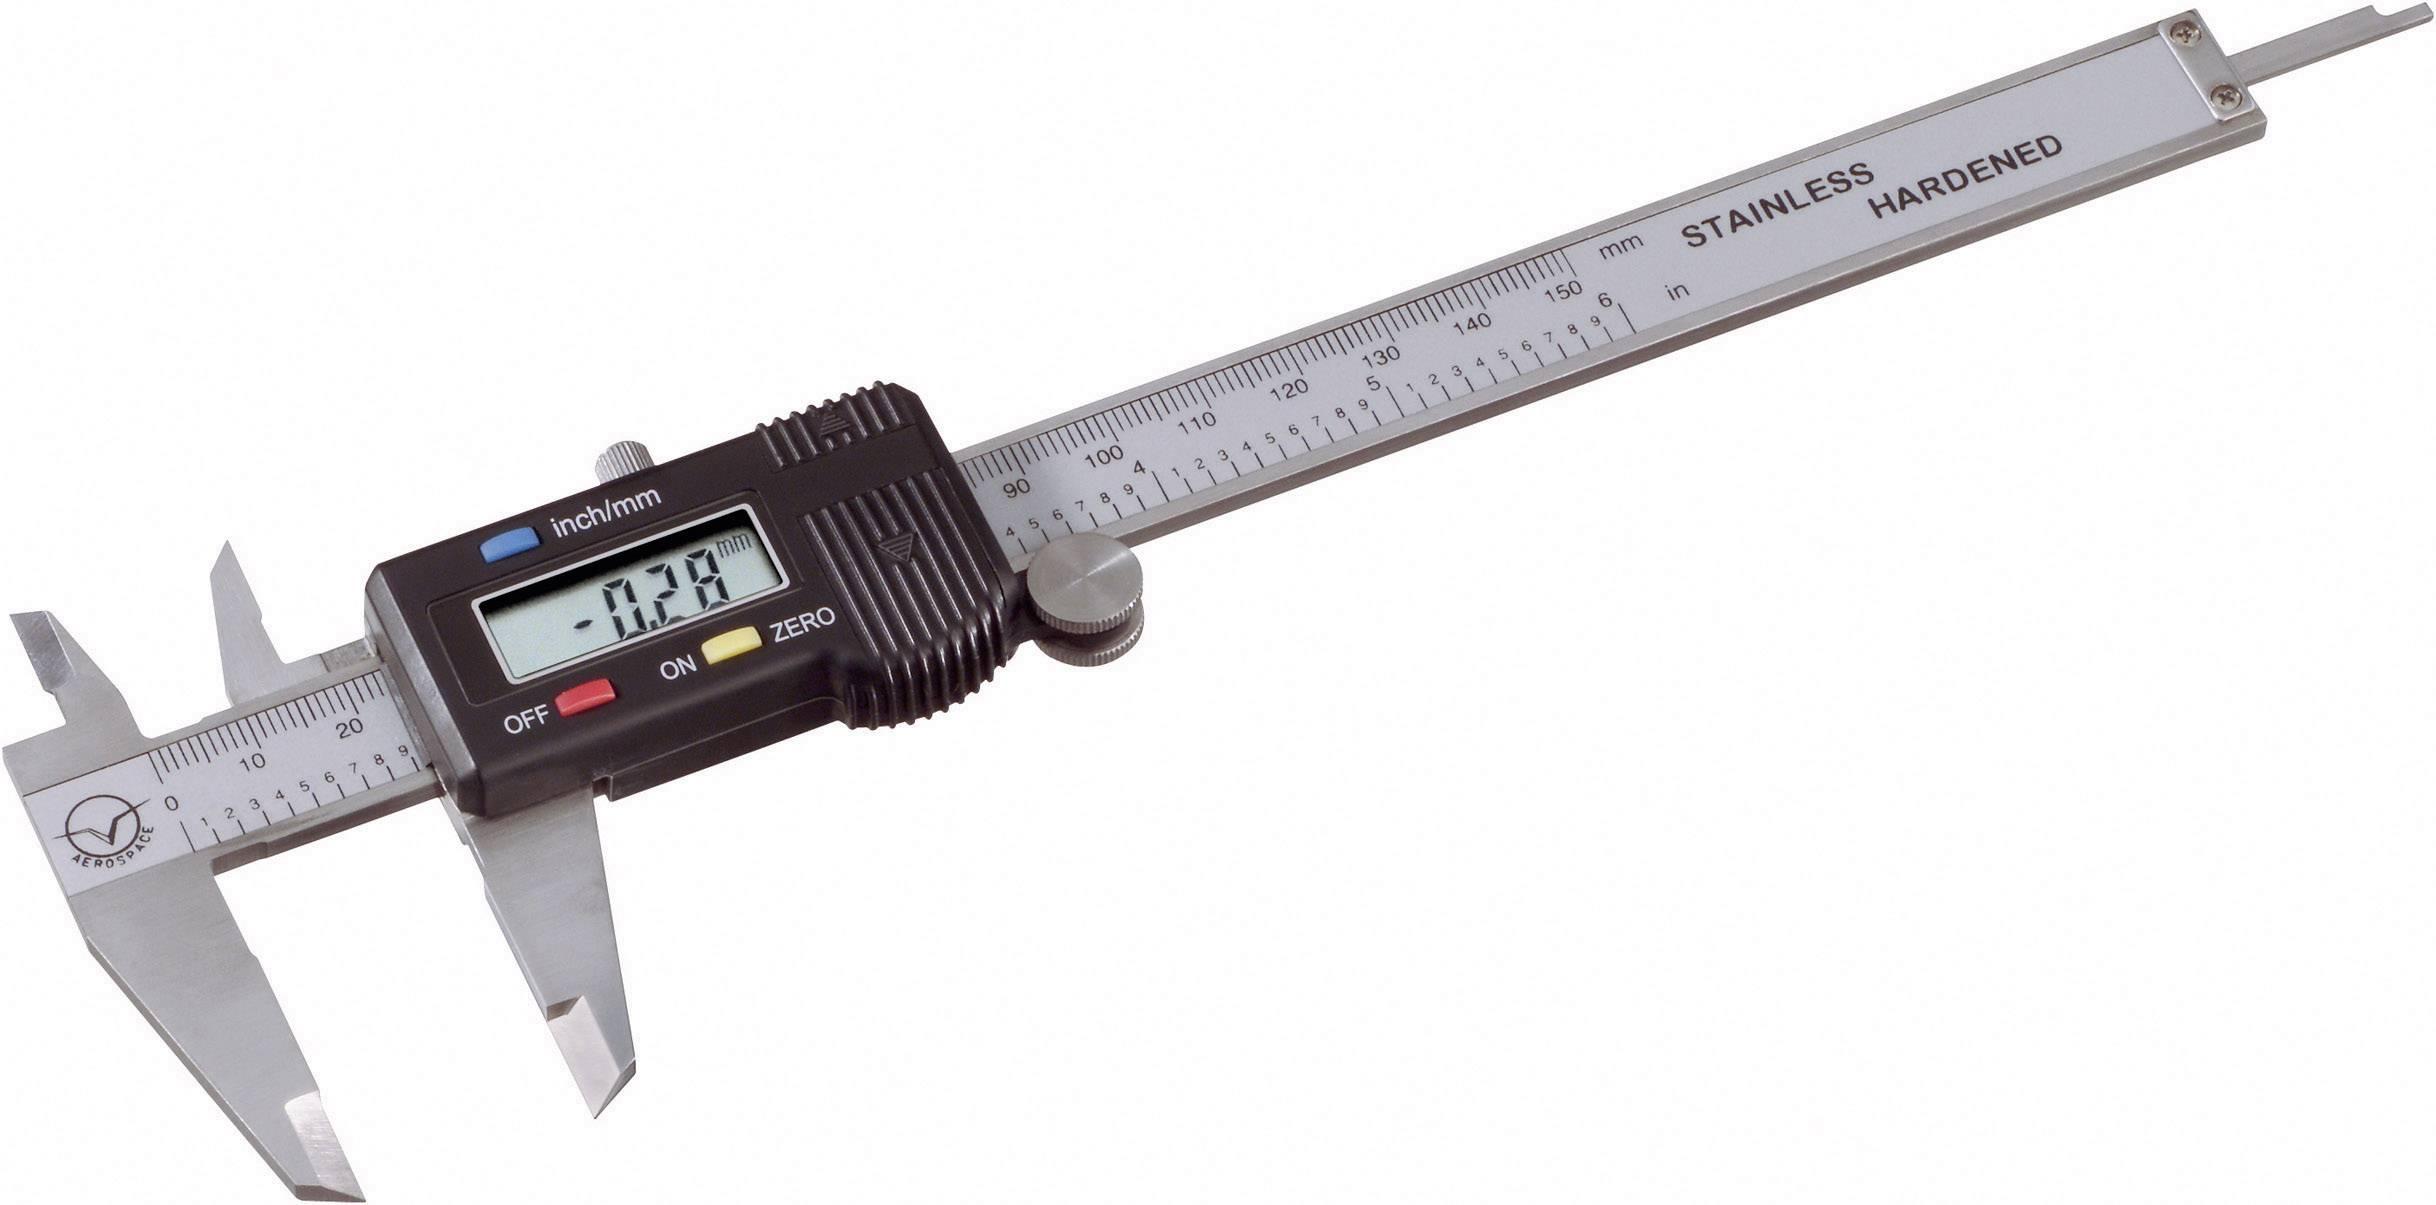 Digitálne posuvné meradlo PMS 150 803308, rozsah merania 150 mm